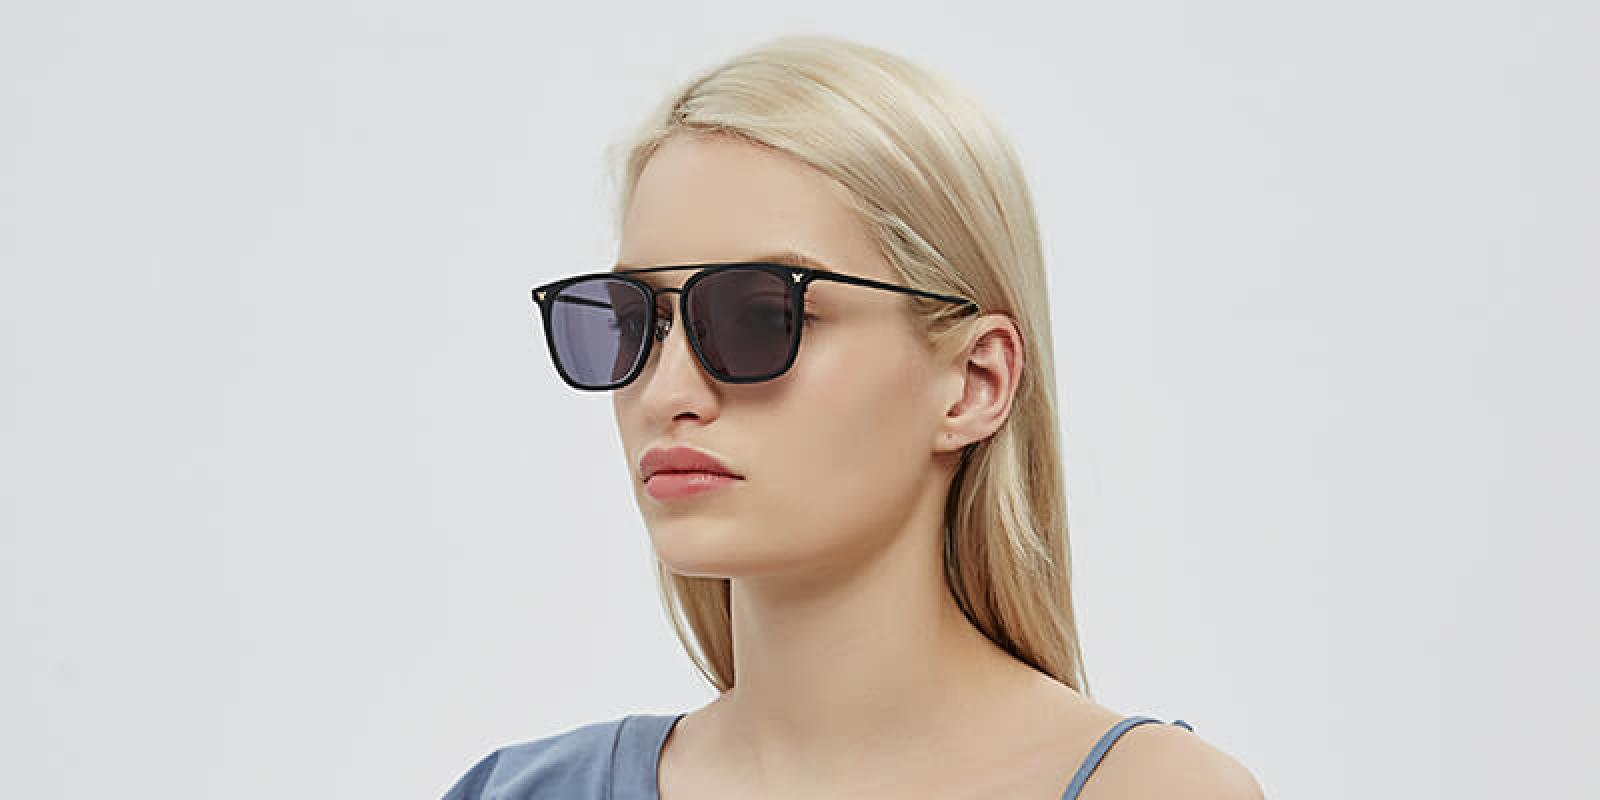 Seagual-Black-Combination / Metal / TR-Sunglasses-detail2